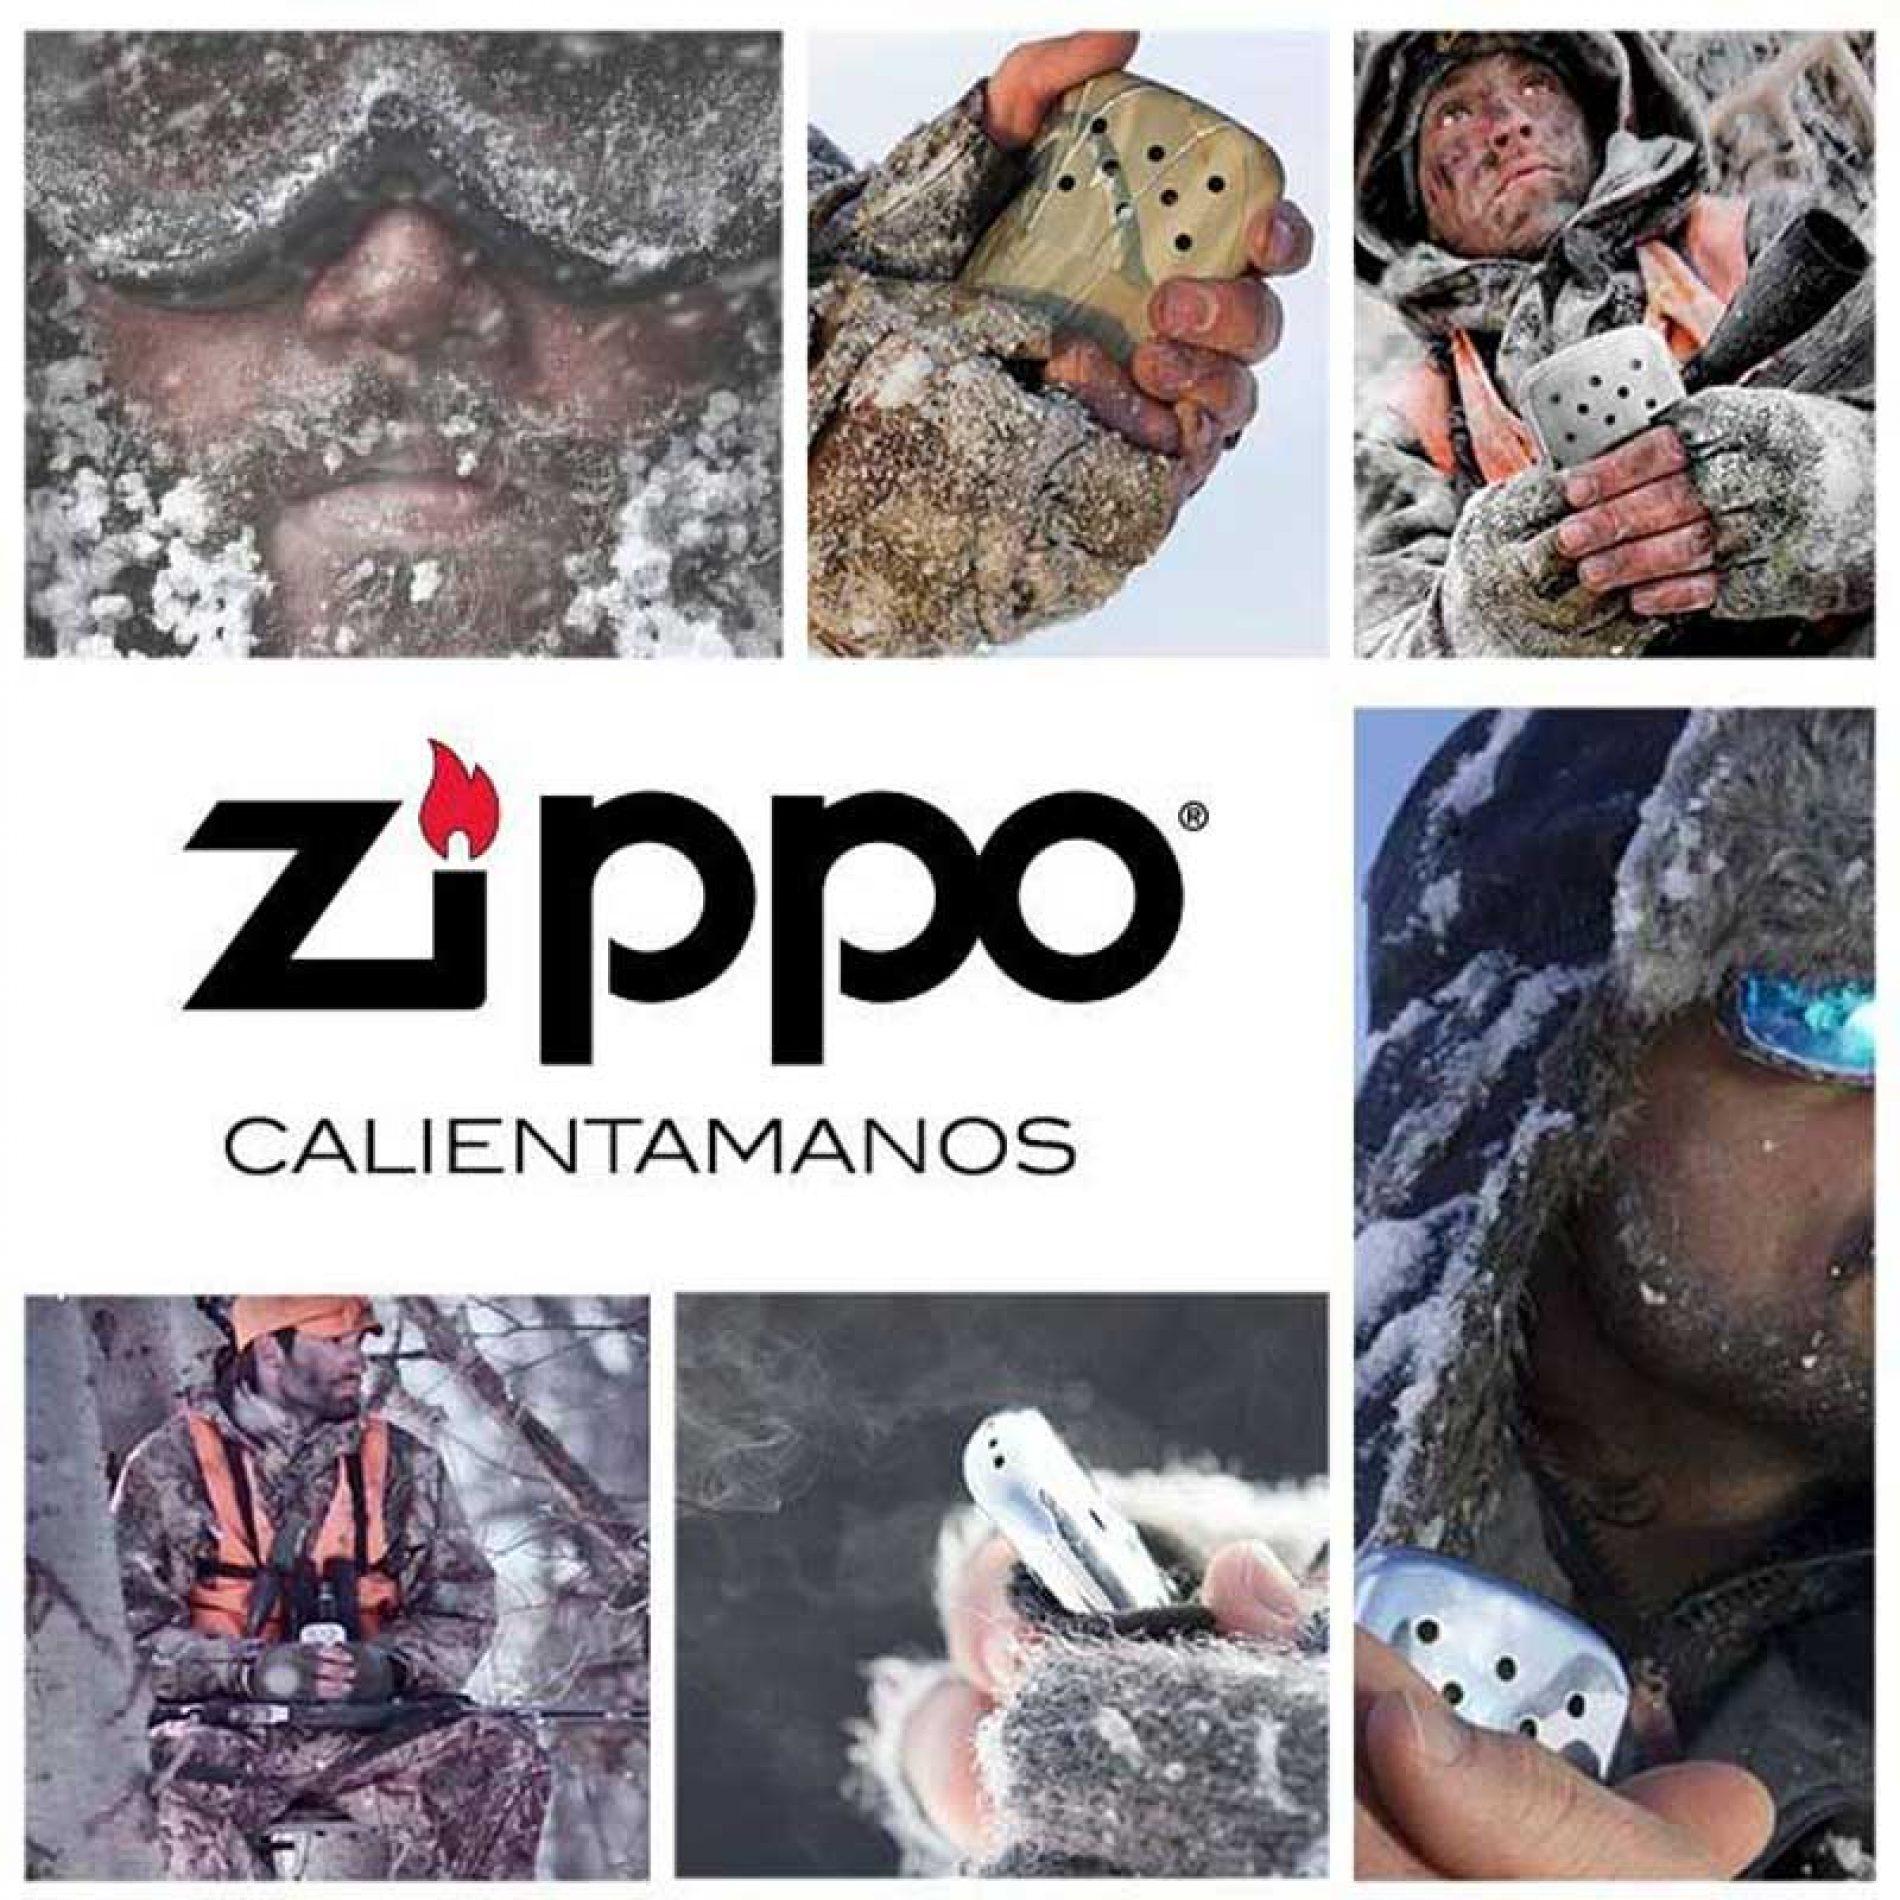 Calentador de manos Zippo. Ande yo caliente…